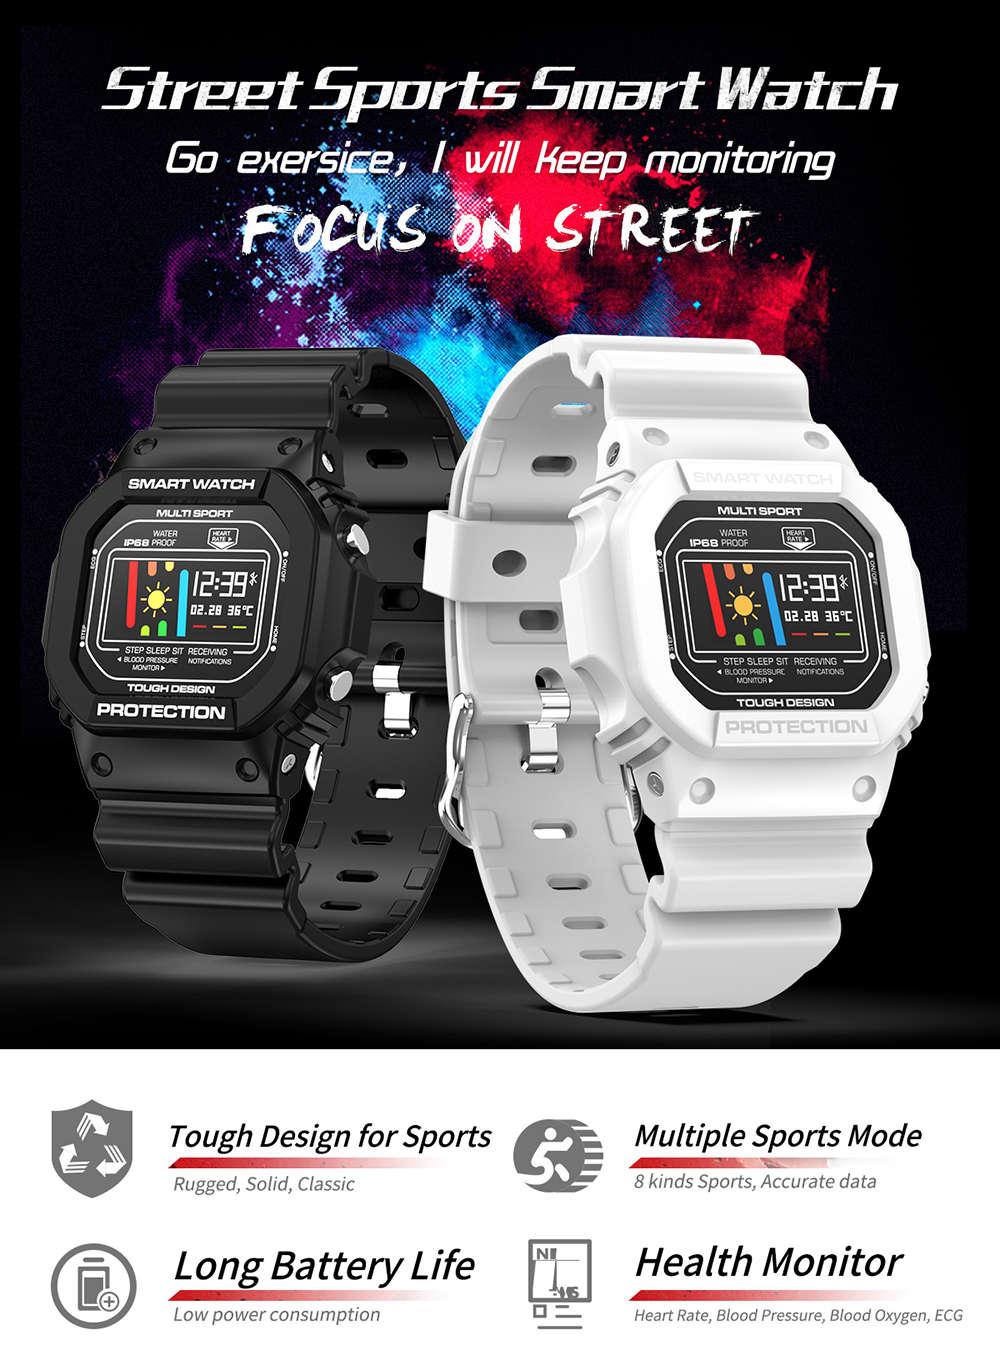 X12 Digital smart watch (1)